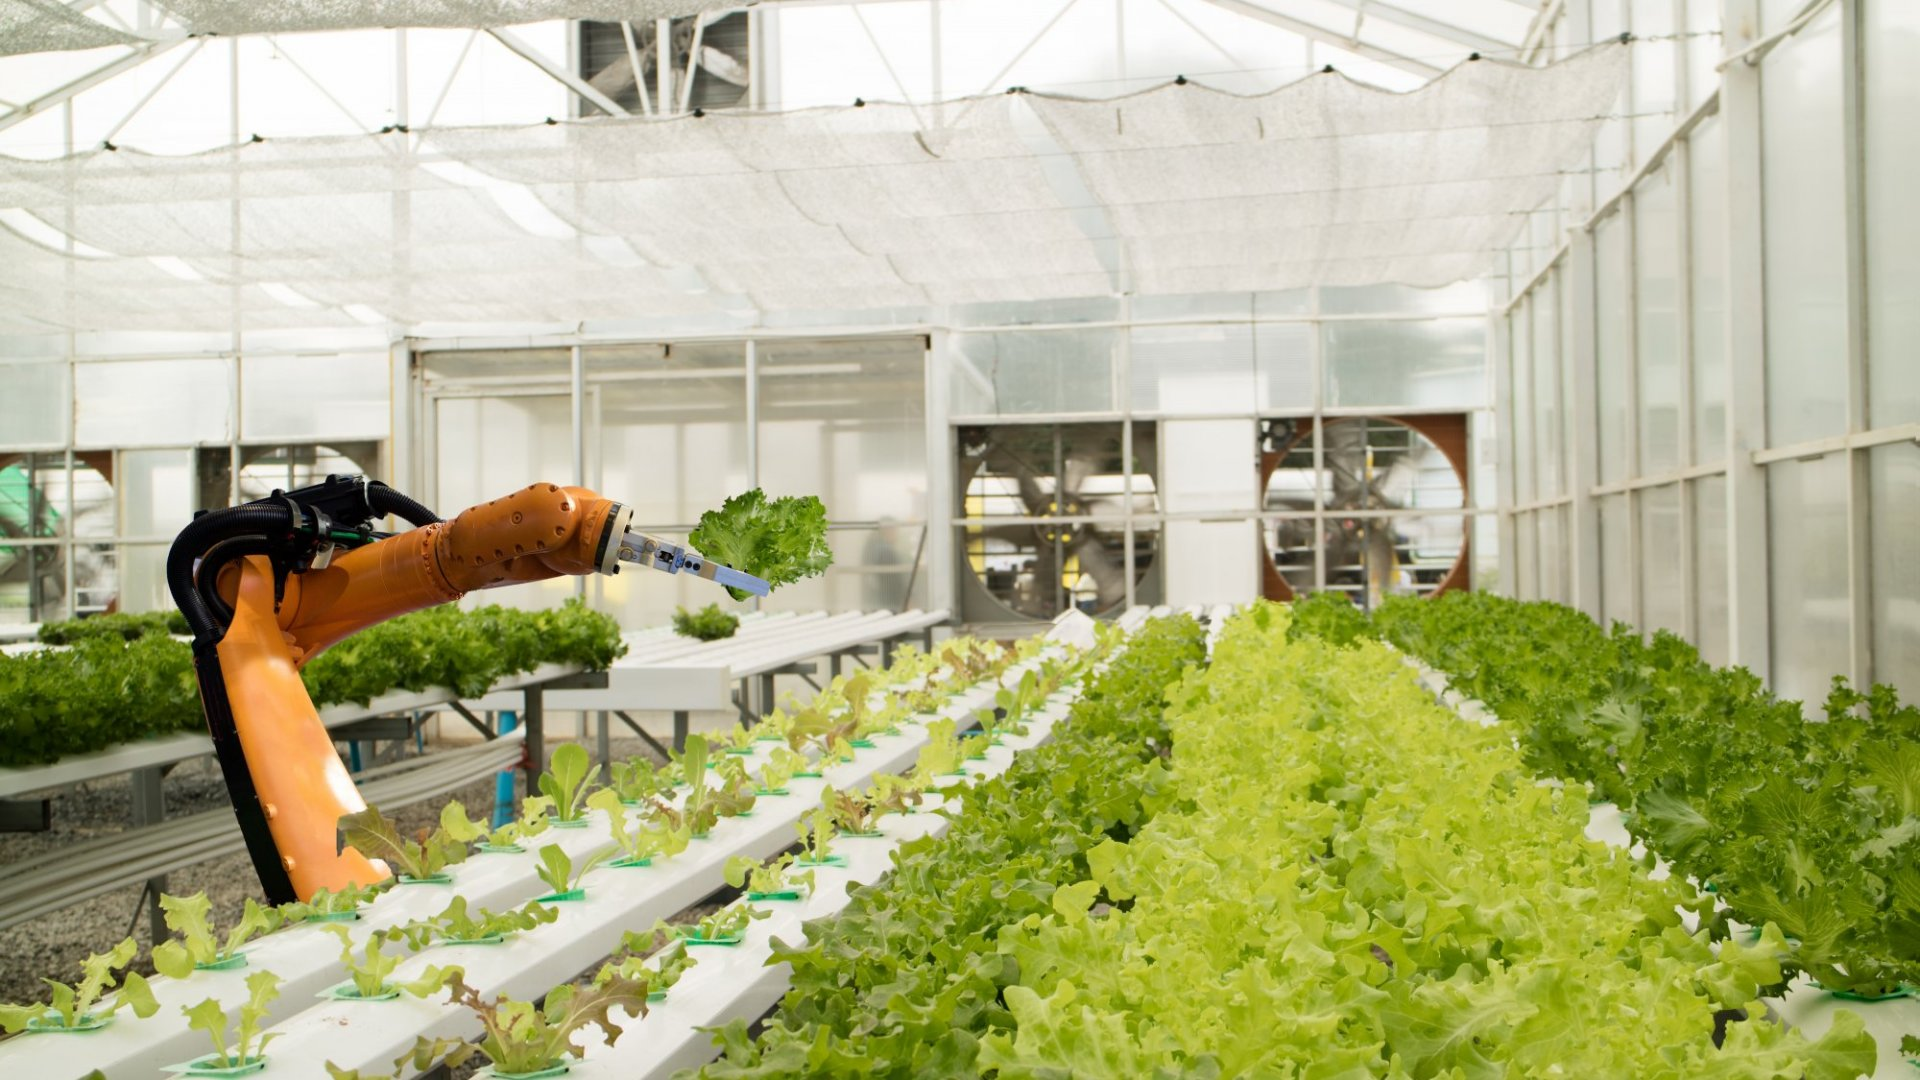 Are Robots the Future of Farming?